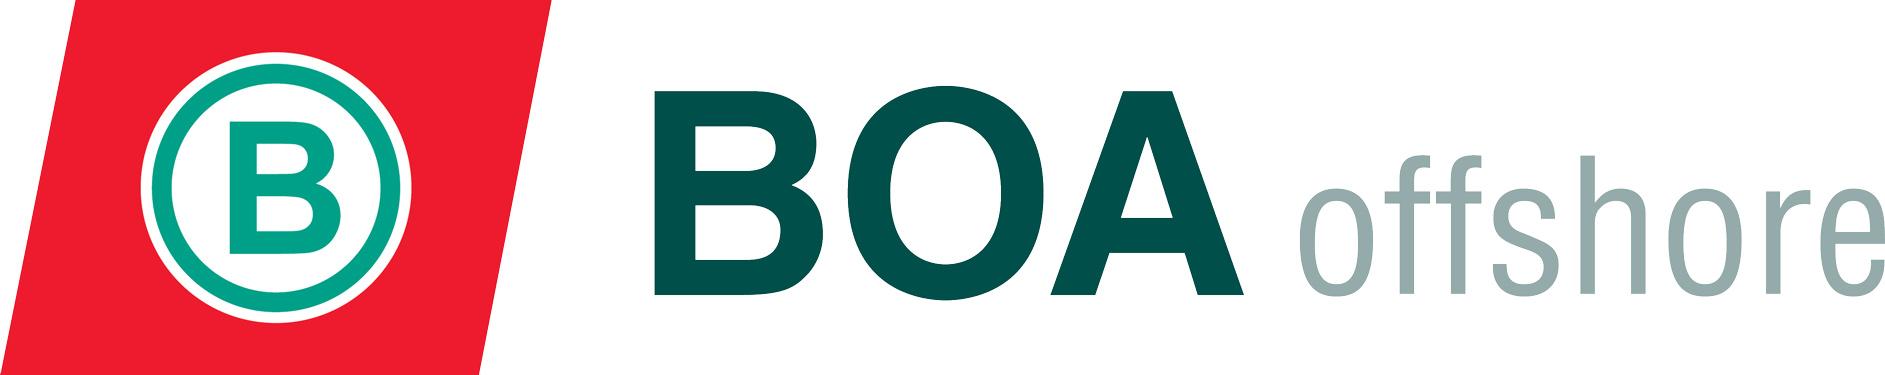 BOA_Logo_offshore_plain